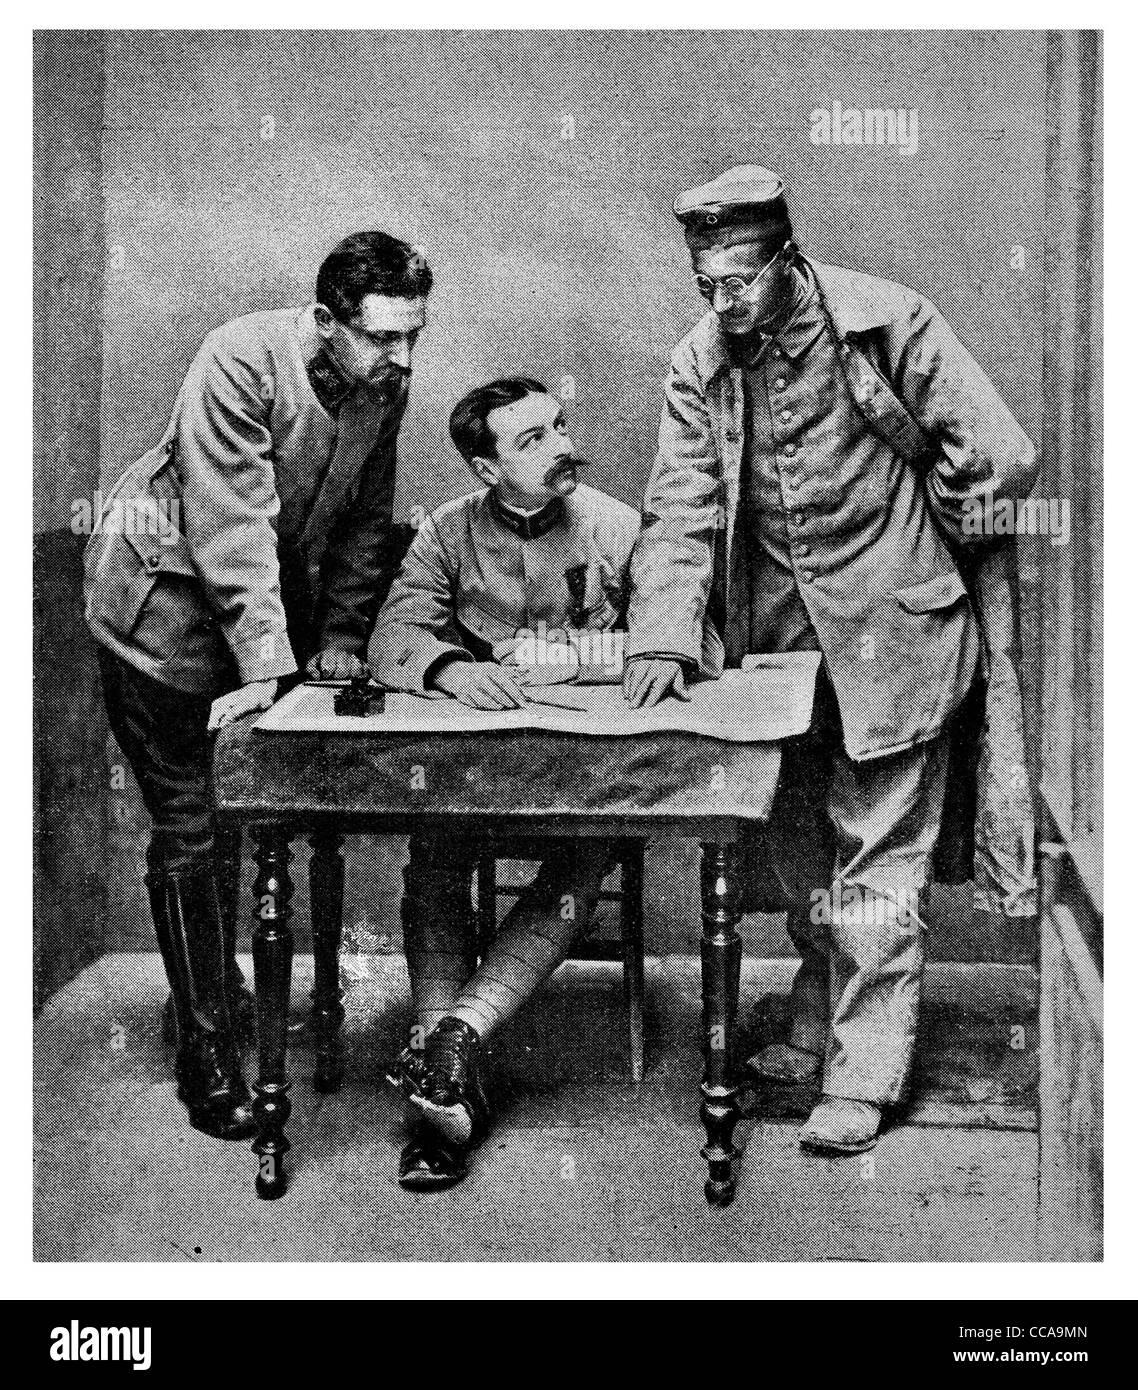 1916 German Traitor trickster spy spies French officer interrogating interrogation prisoner questioning intelligence - Stock Image